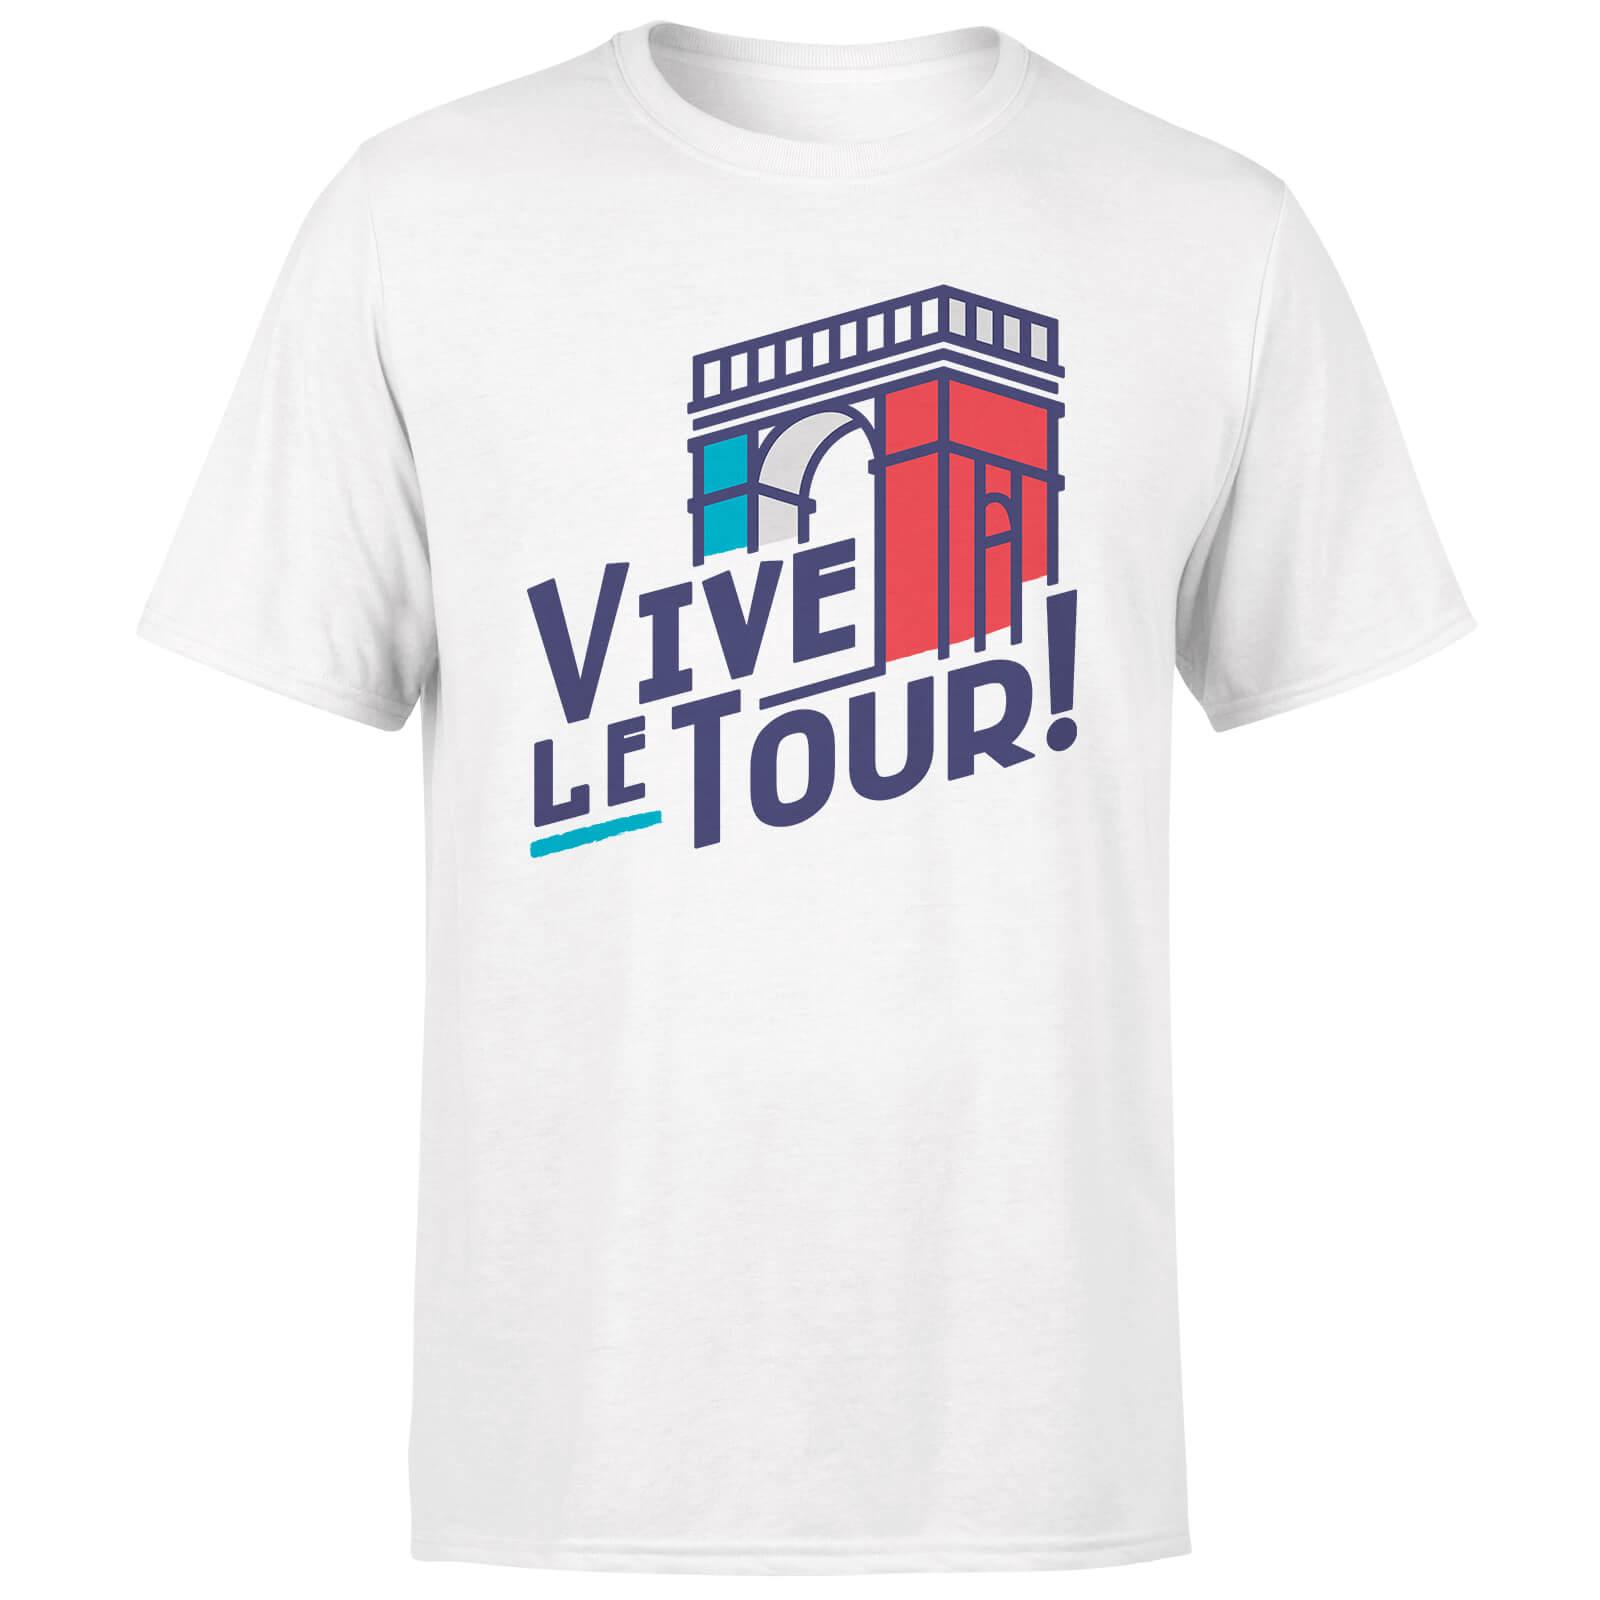 Vive Le Tour Men's White T-Shirt - M - White